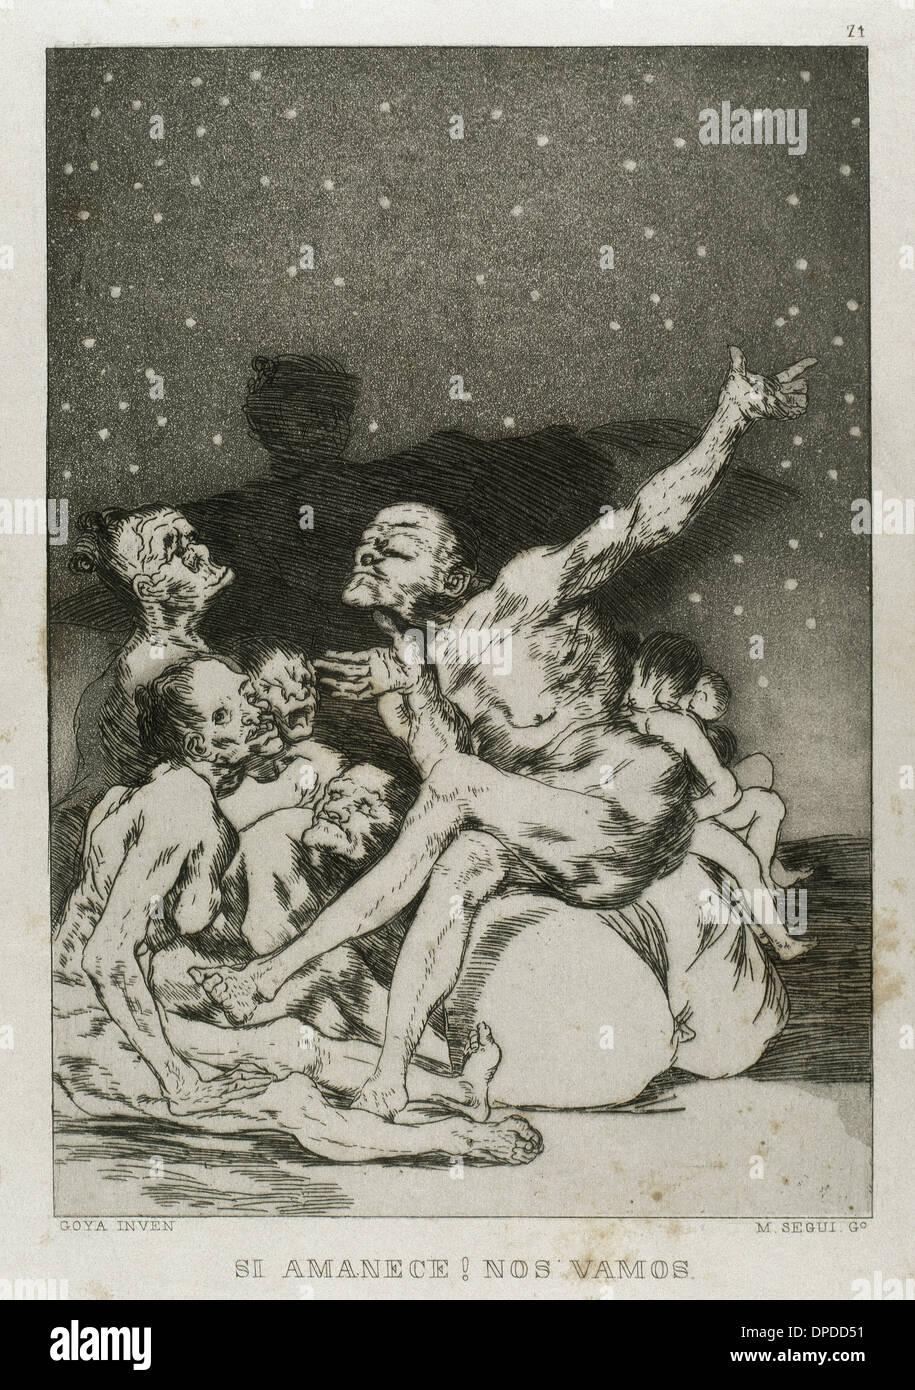 Goya (1746-1828). Spanish painter and printmaker. Los Caprichos. Si amanece, nos vamos (If dawns, we're leaving). Number 71. - Stock Image